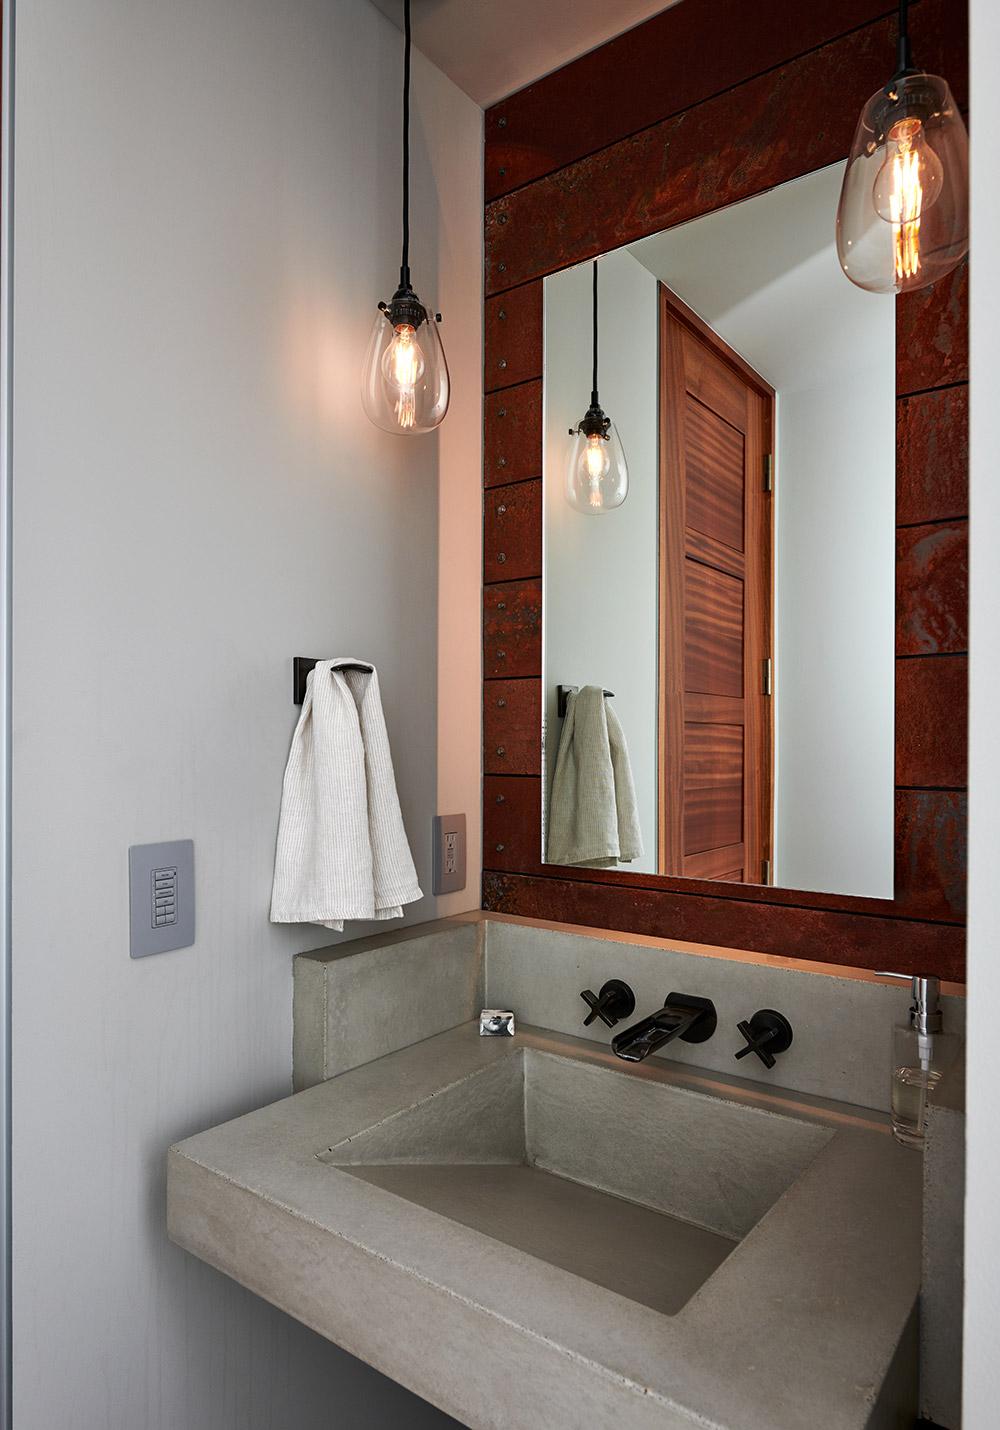 case-study-2-well-lit-lodge-bathroom-1